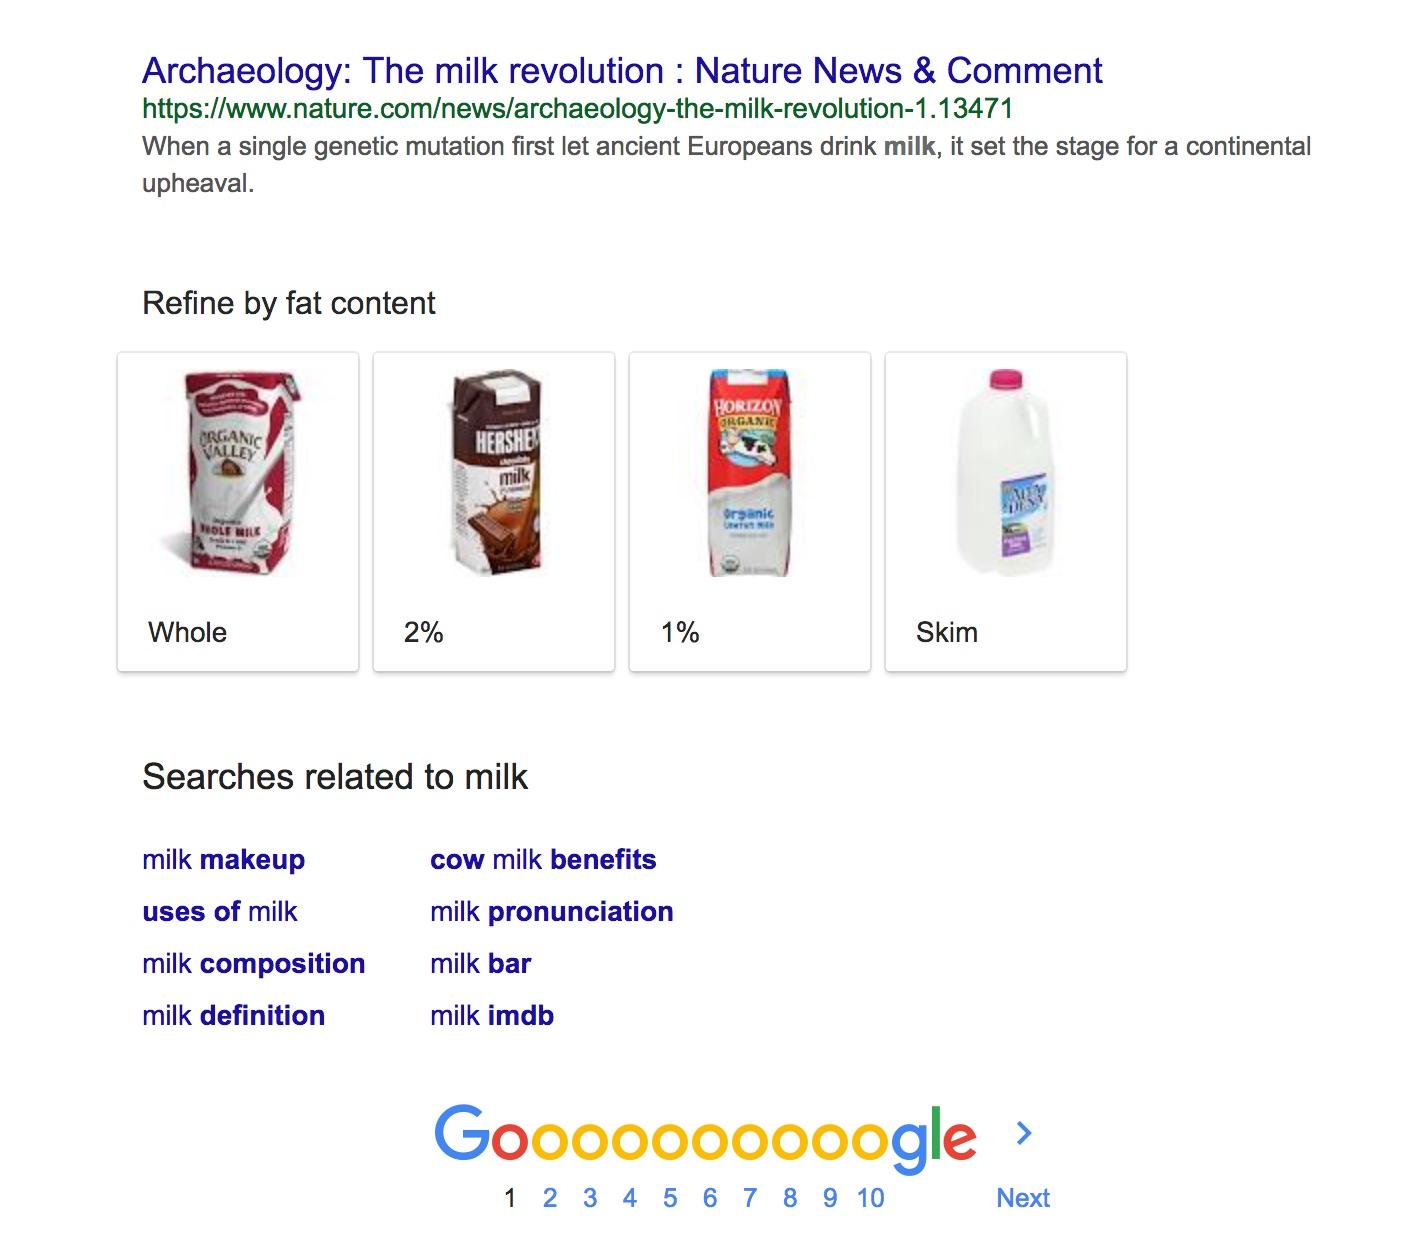 搜尋 milk